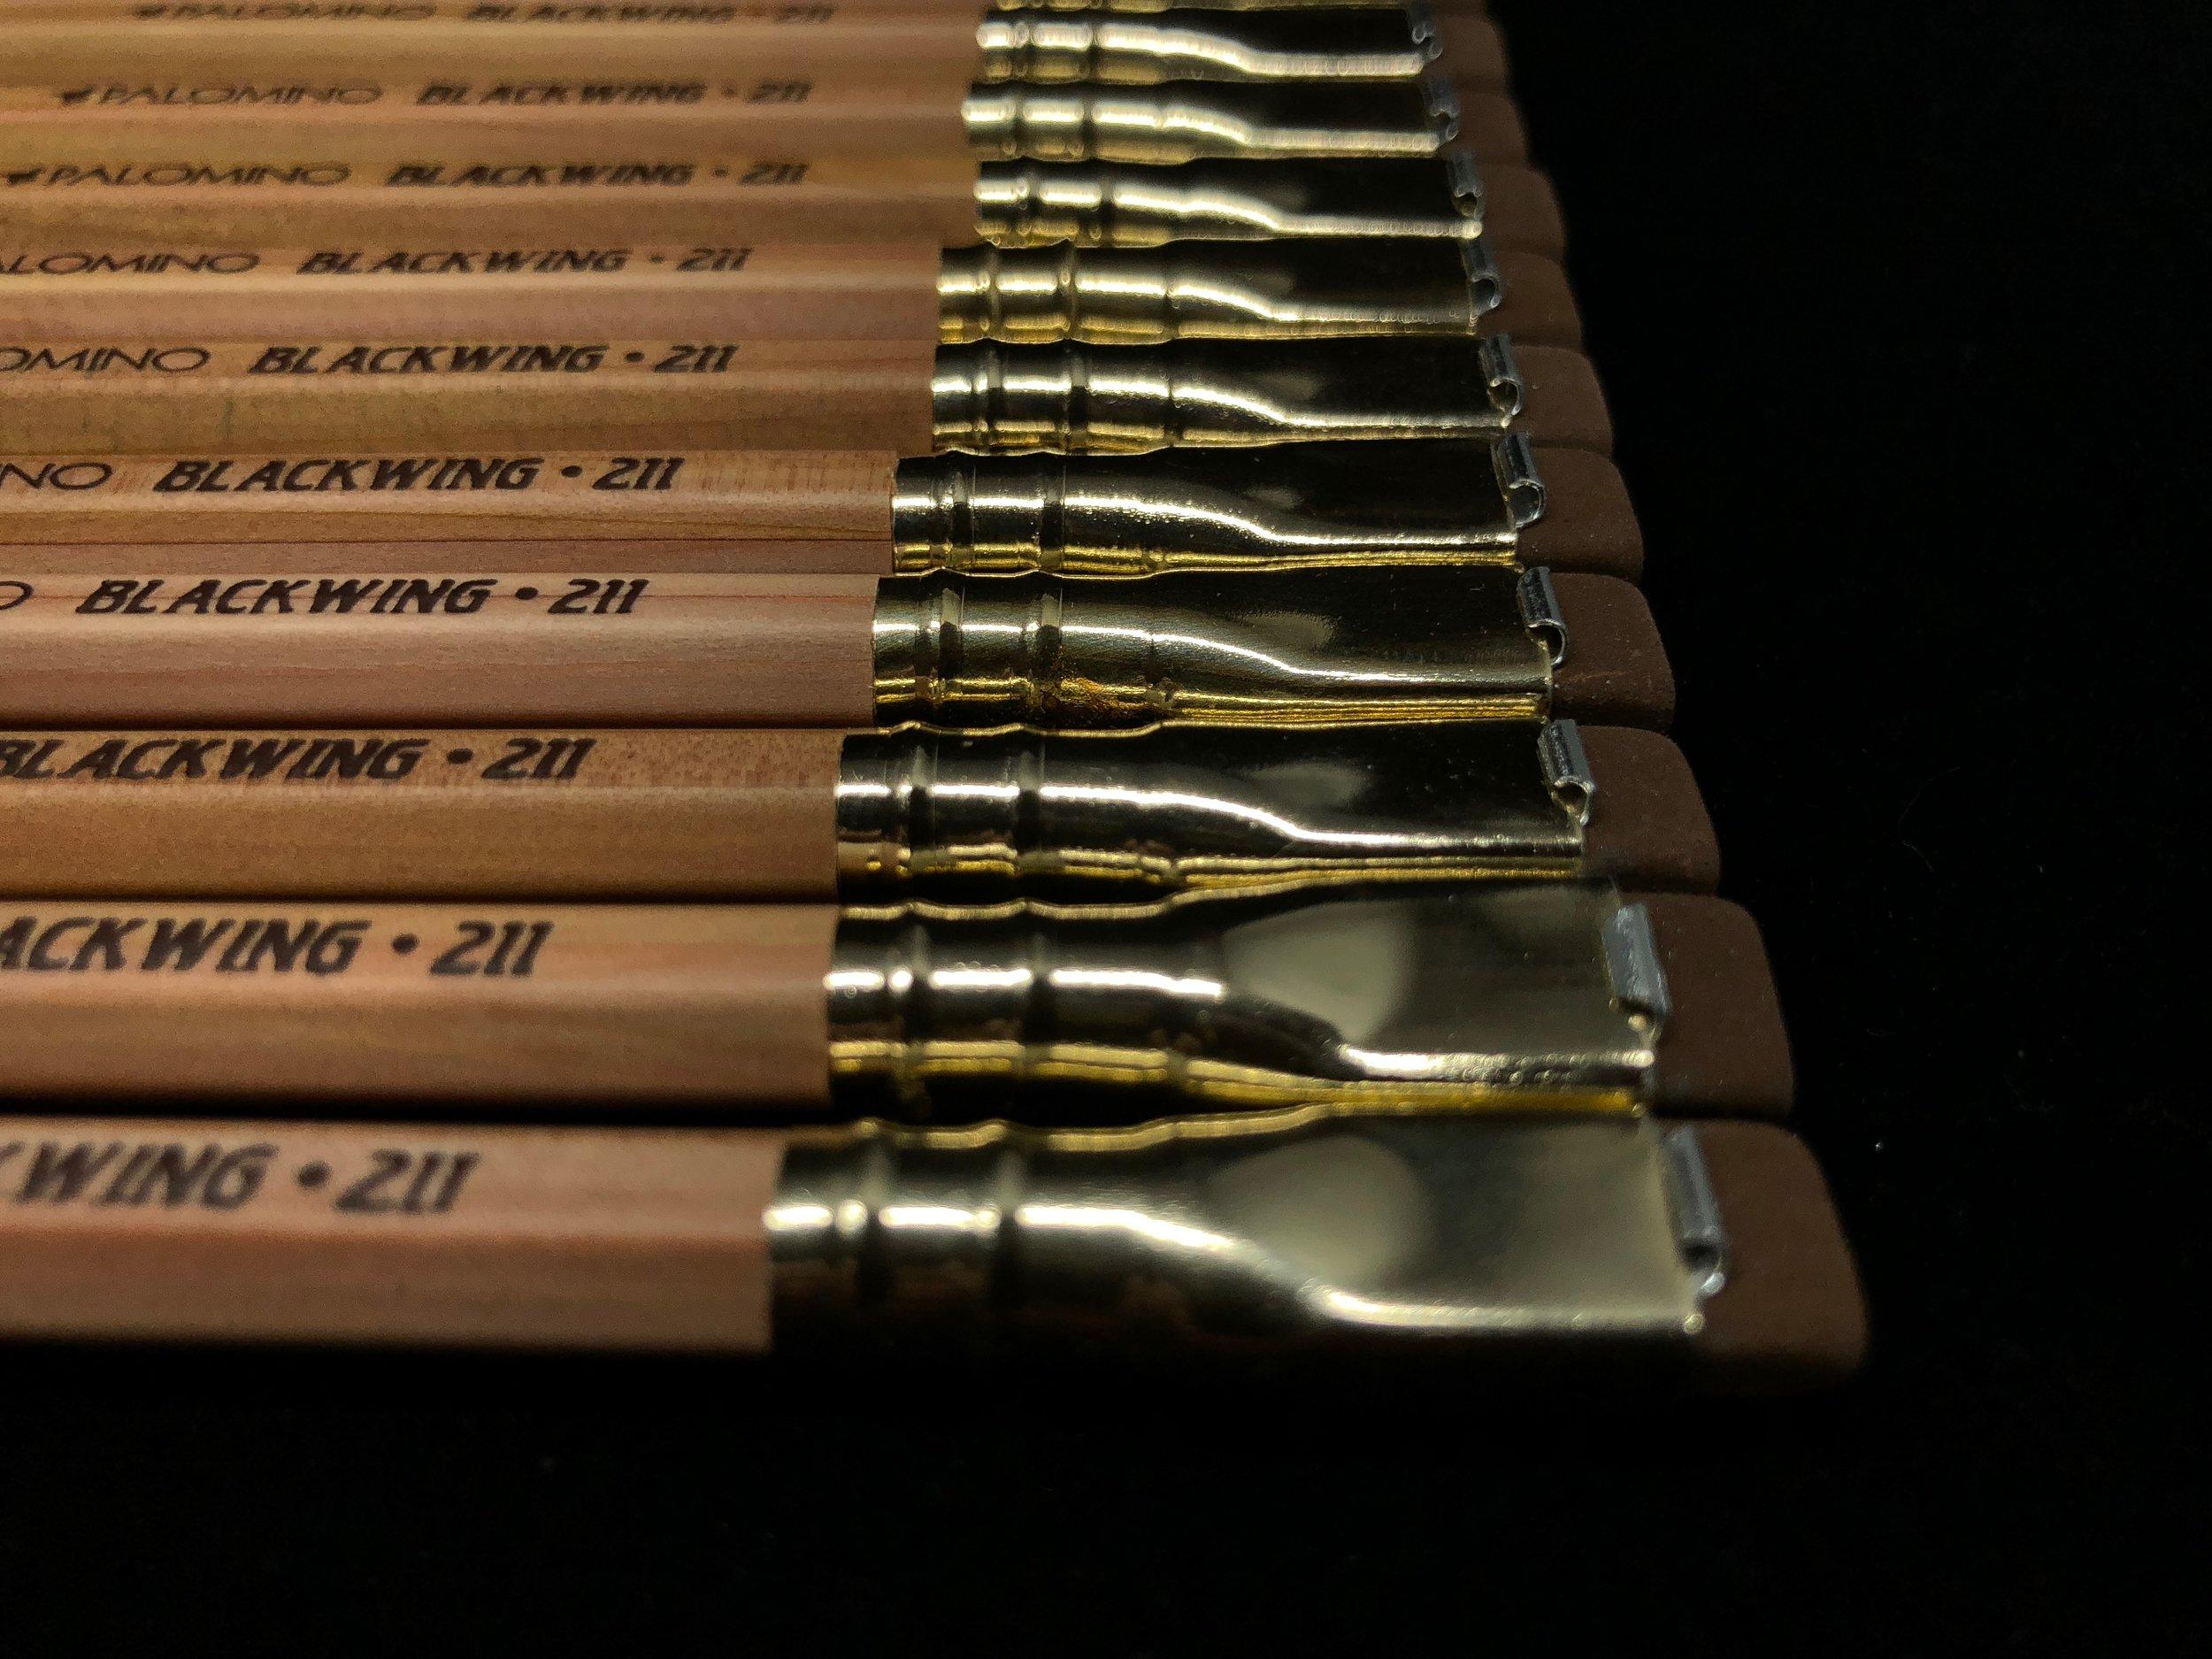 palomino-blackwing-211-pencil-7.jpg